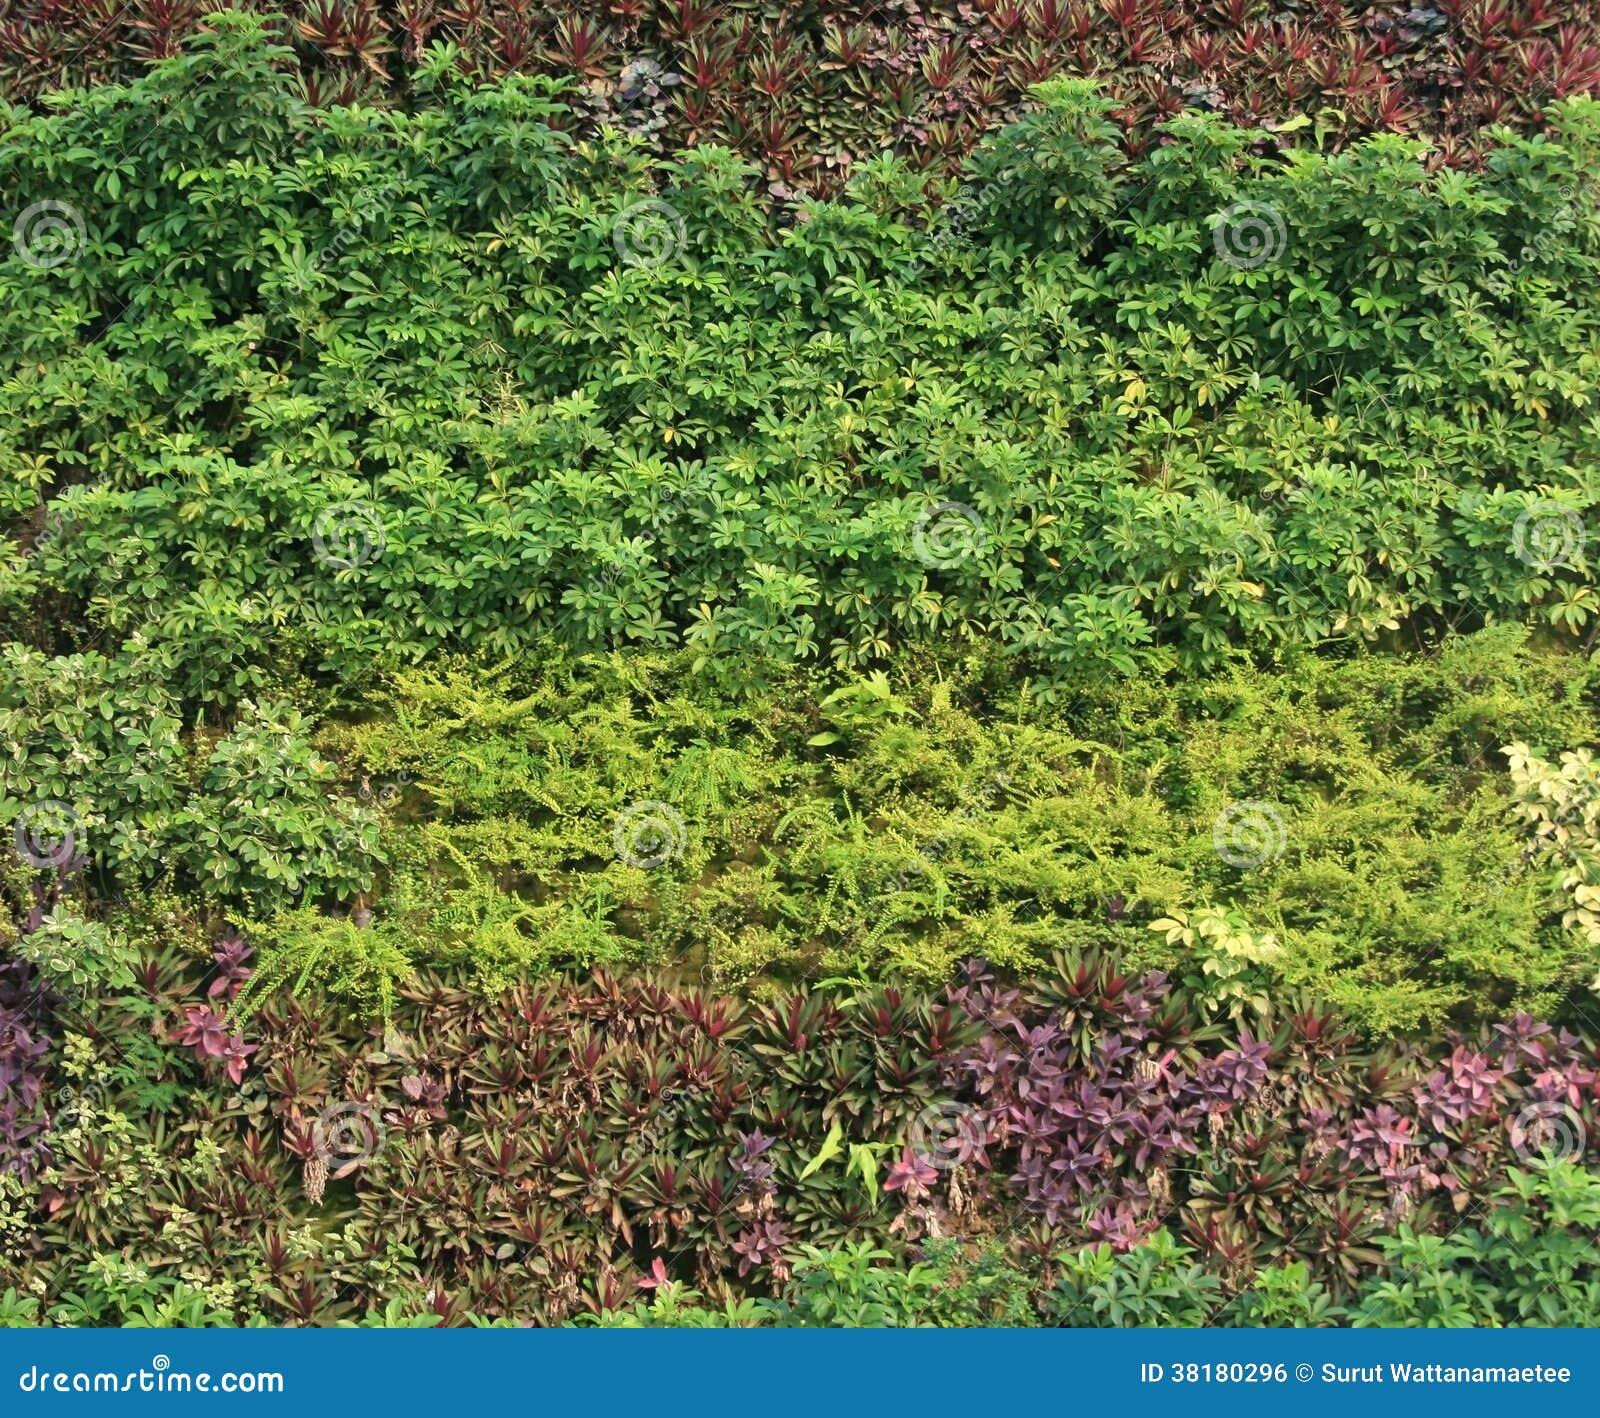 Onion Wallpaper Hd: Green Wall Vertical Garden Stock Photo. Image Of